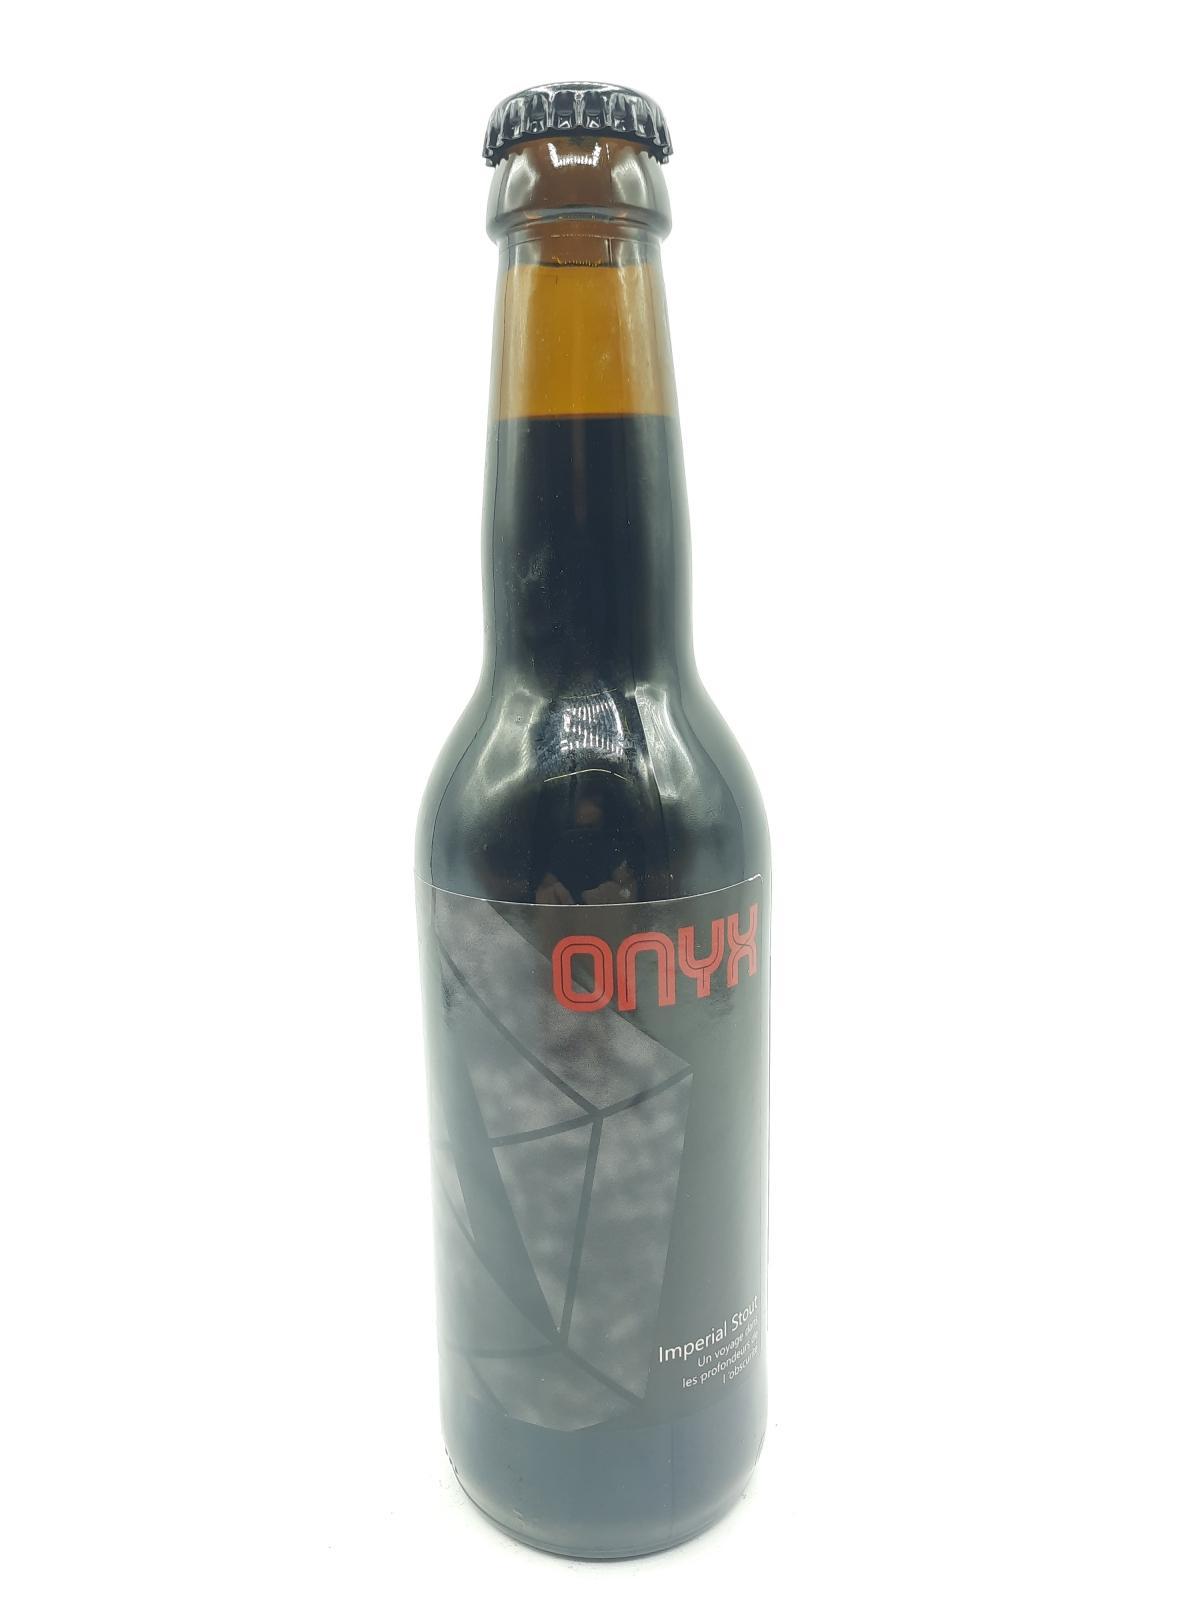 Img Onyx Imperial Stout